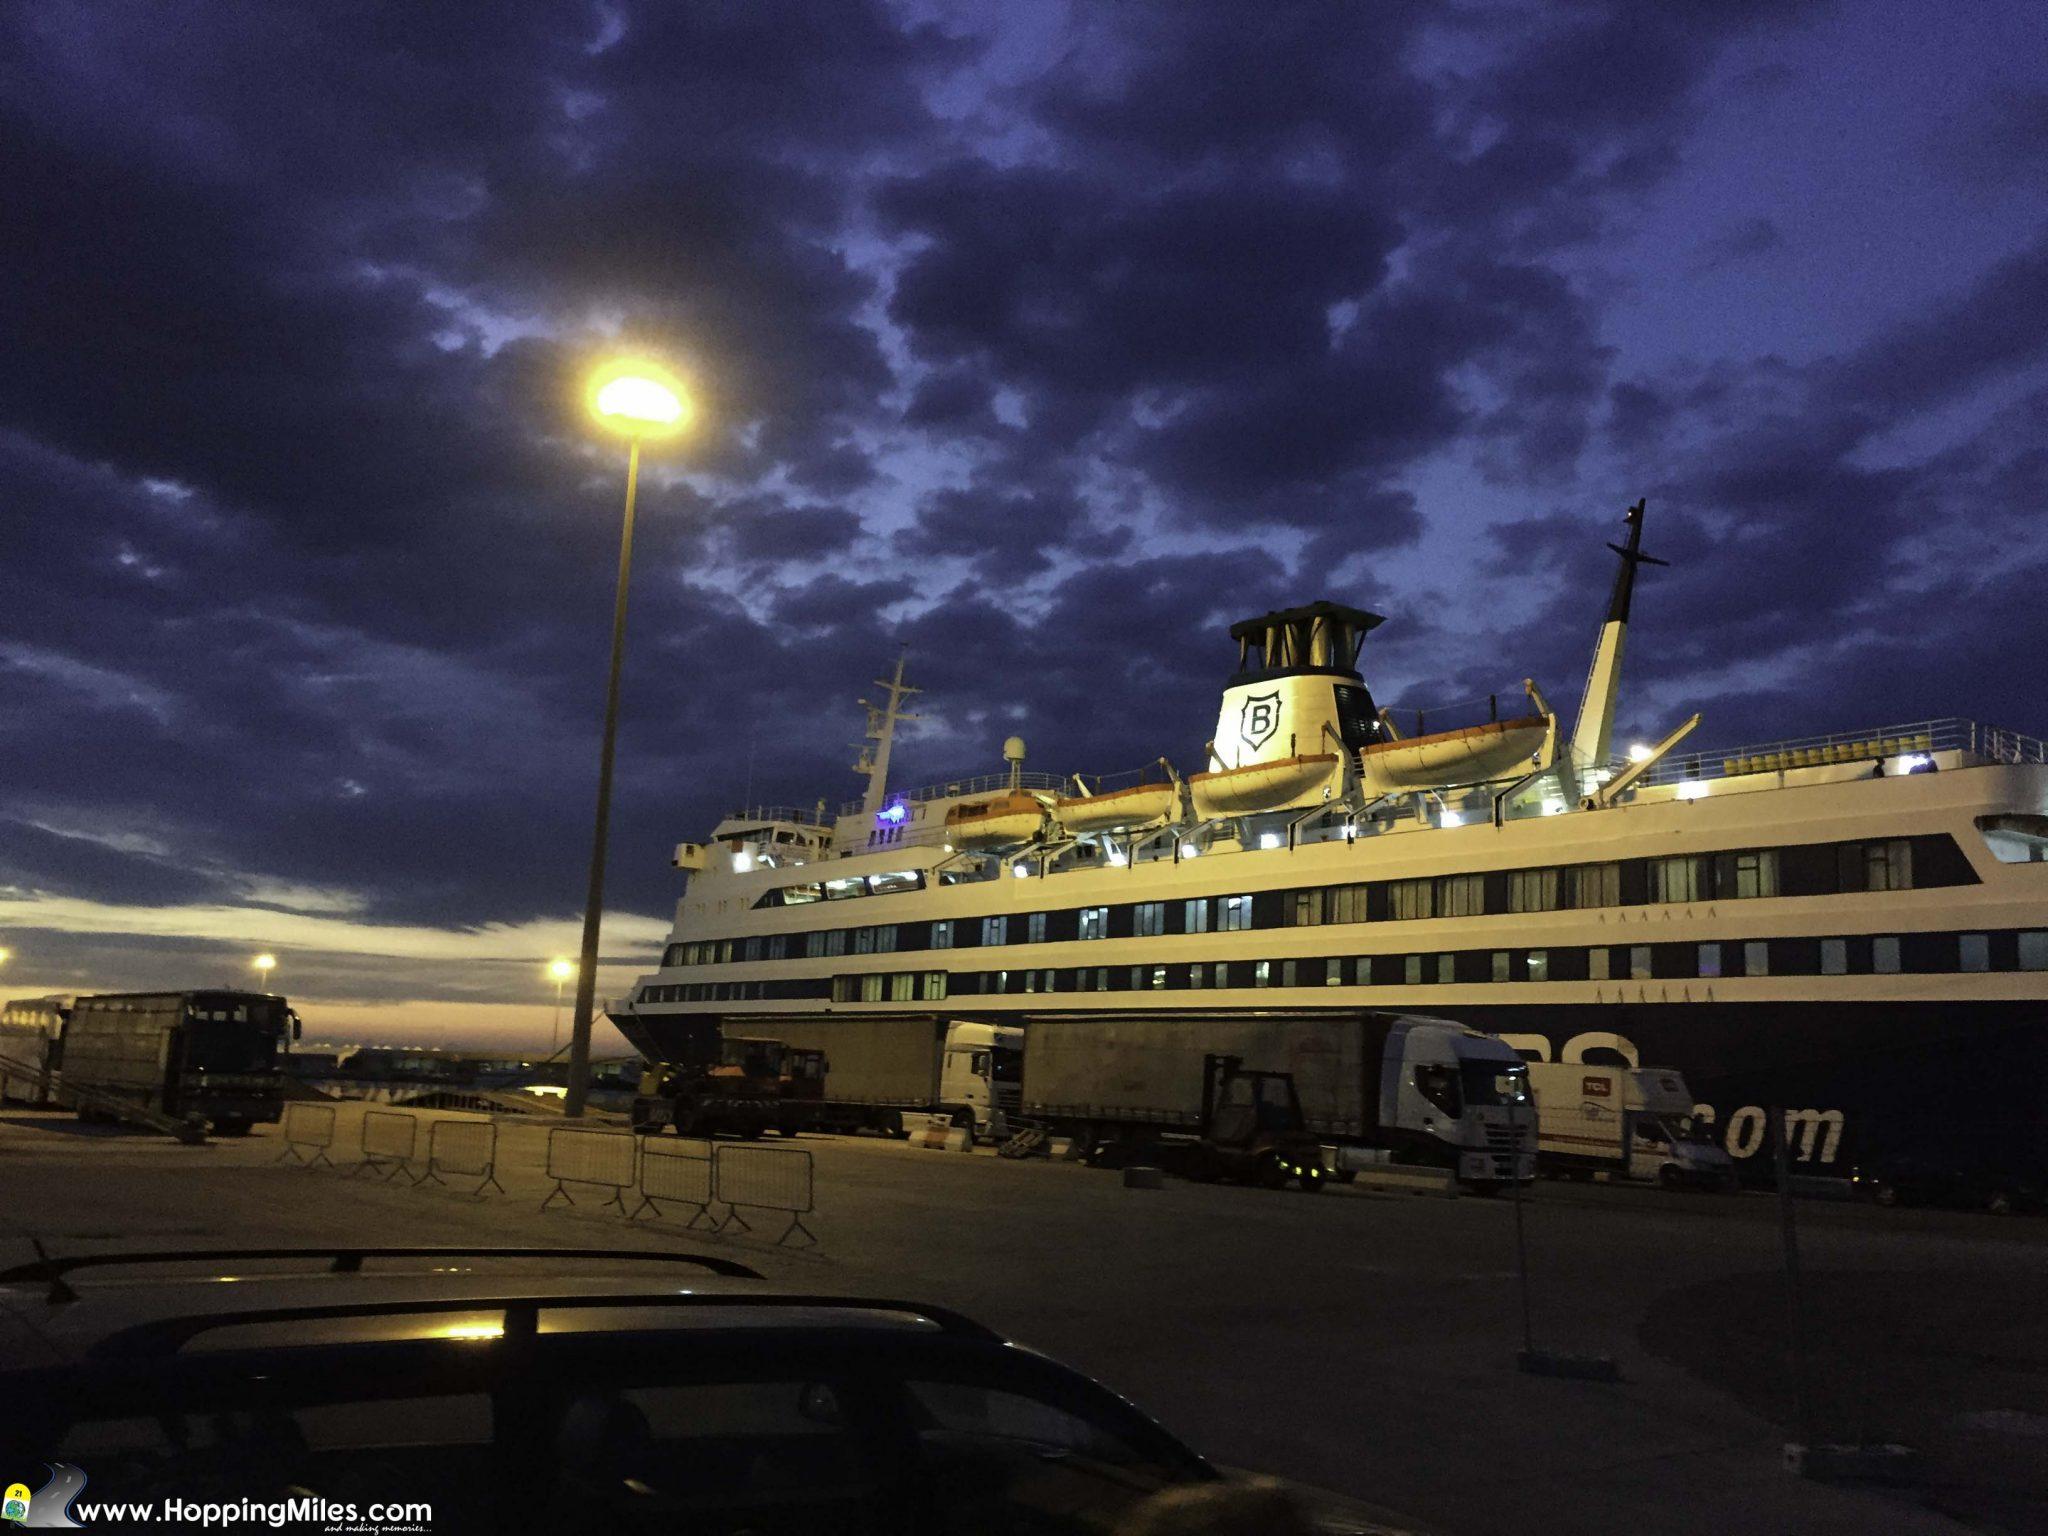 Jadrolinija ferry review